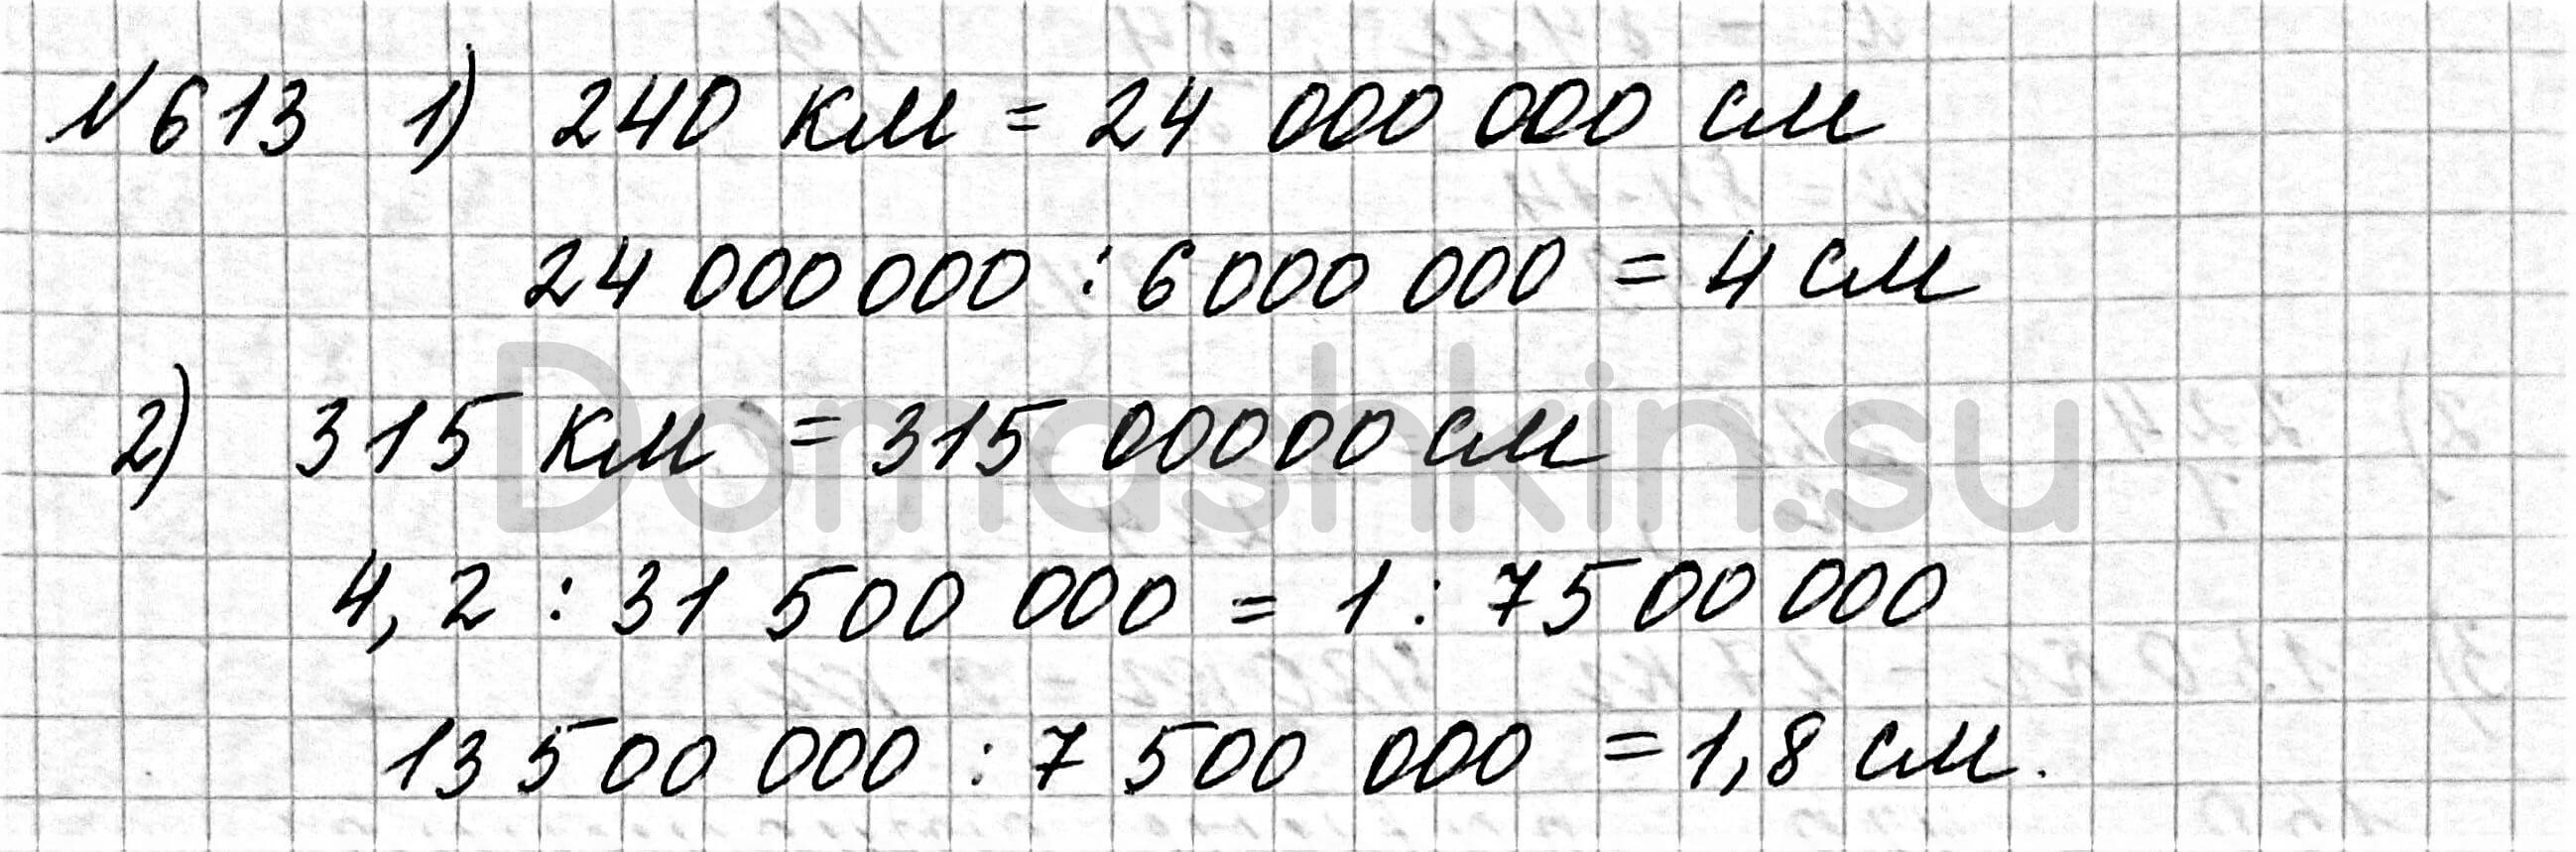 Математика 6 класс учебник Мерзляк номер 613 решение